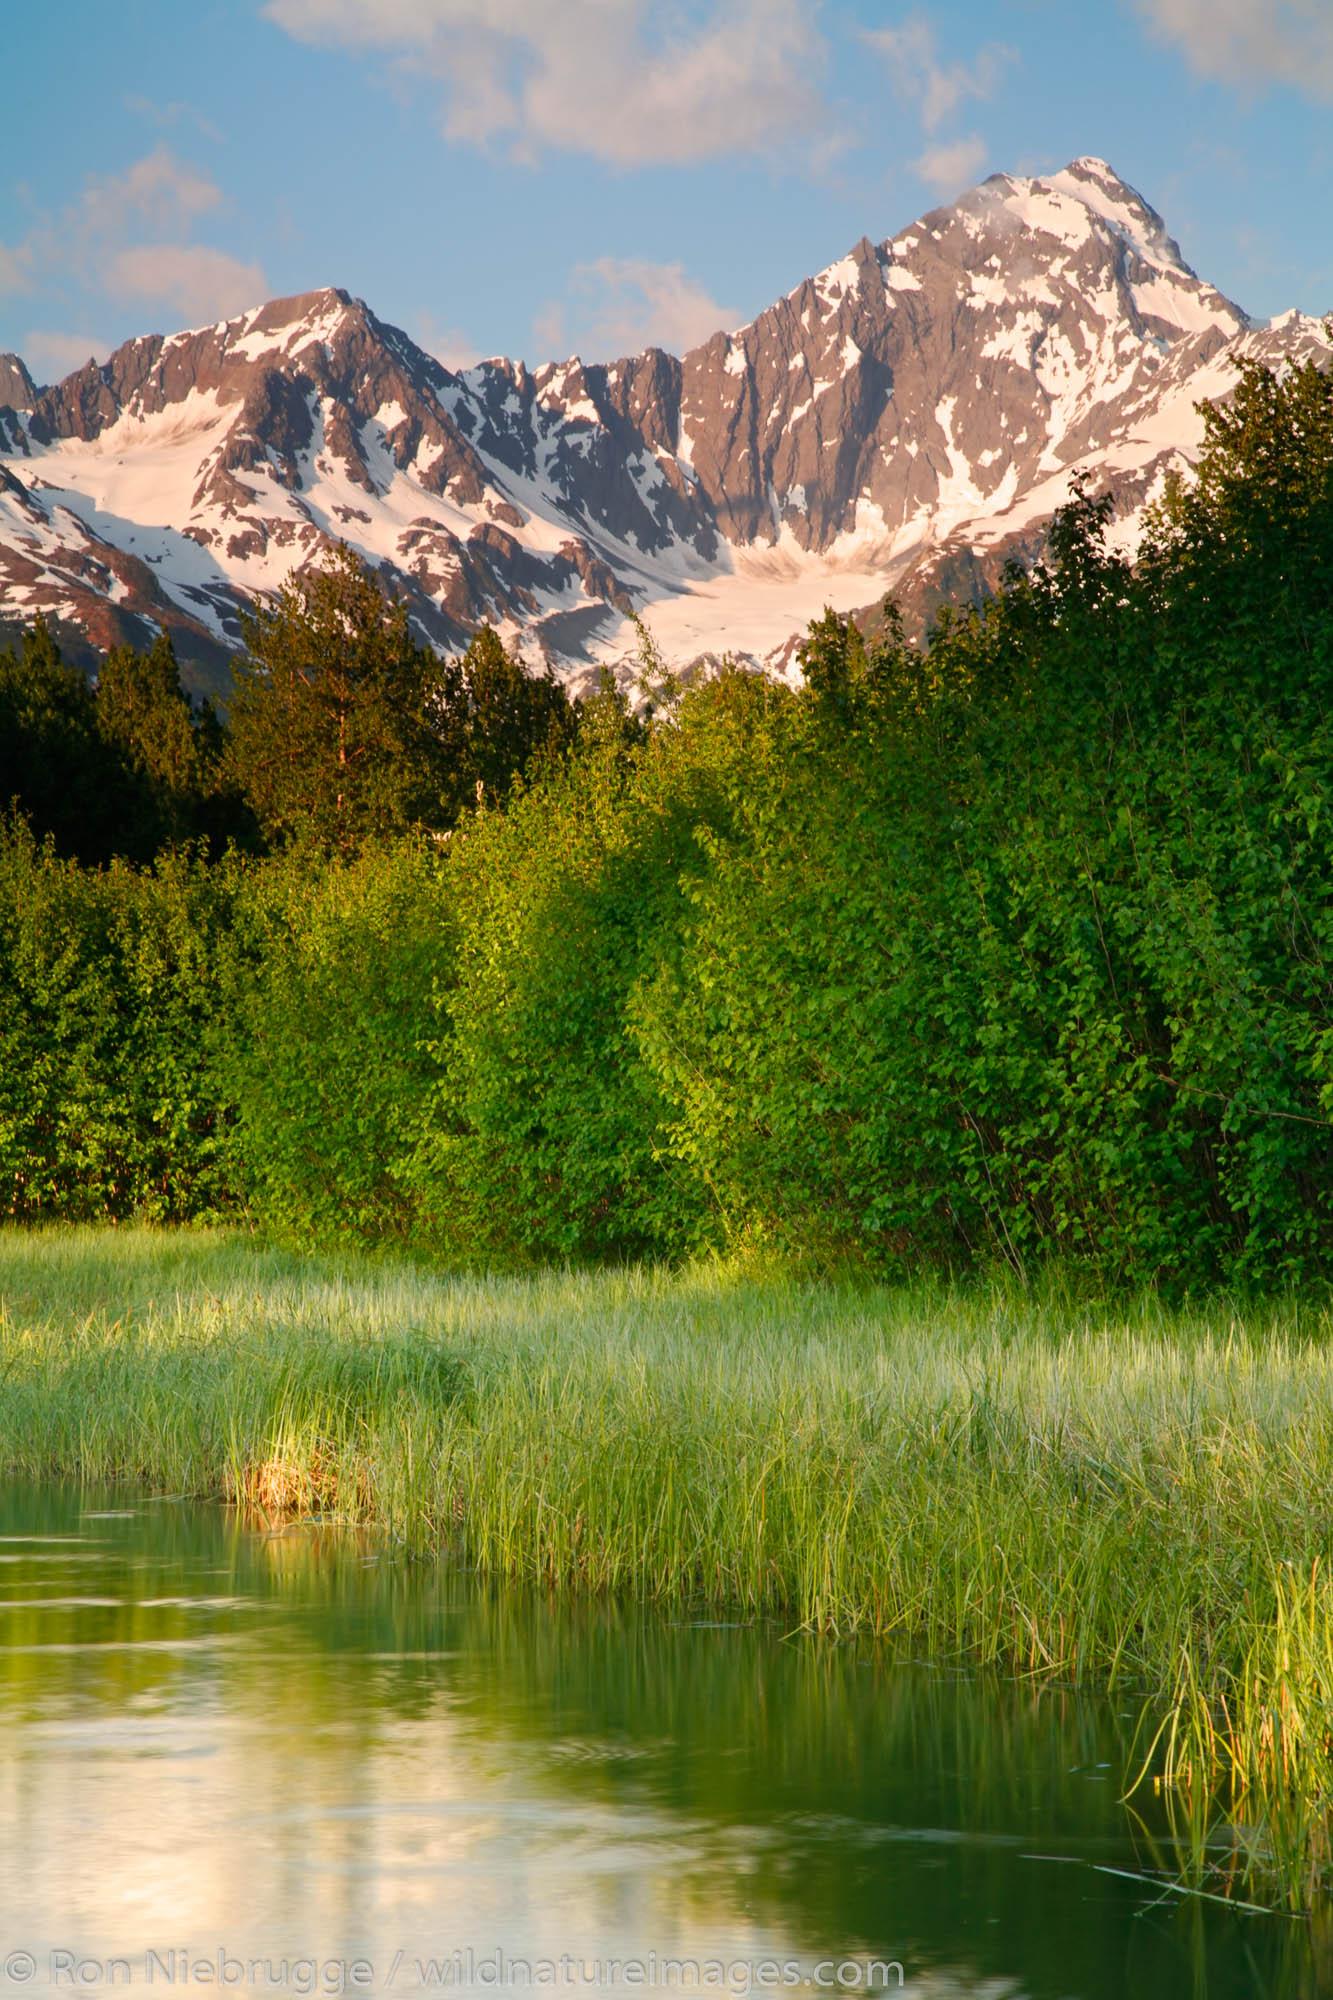 Mt. Alice and a small pond on the Kenai Peninsula, Chugach National Forest, Seward, Alaska.